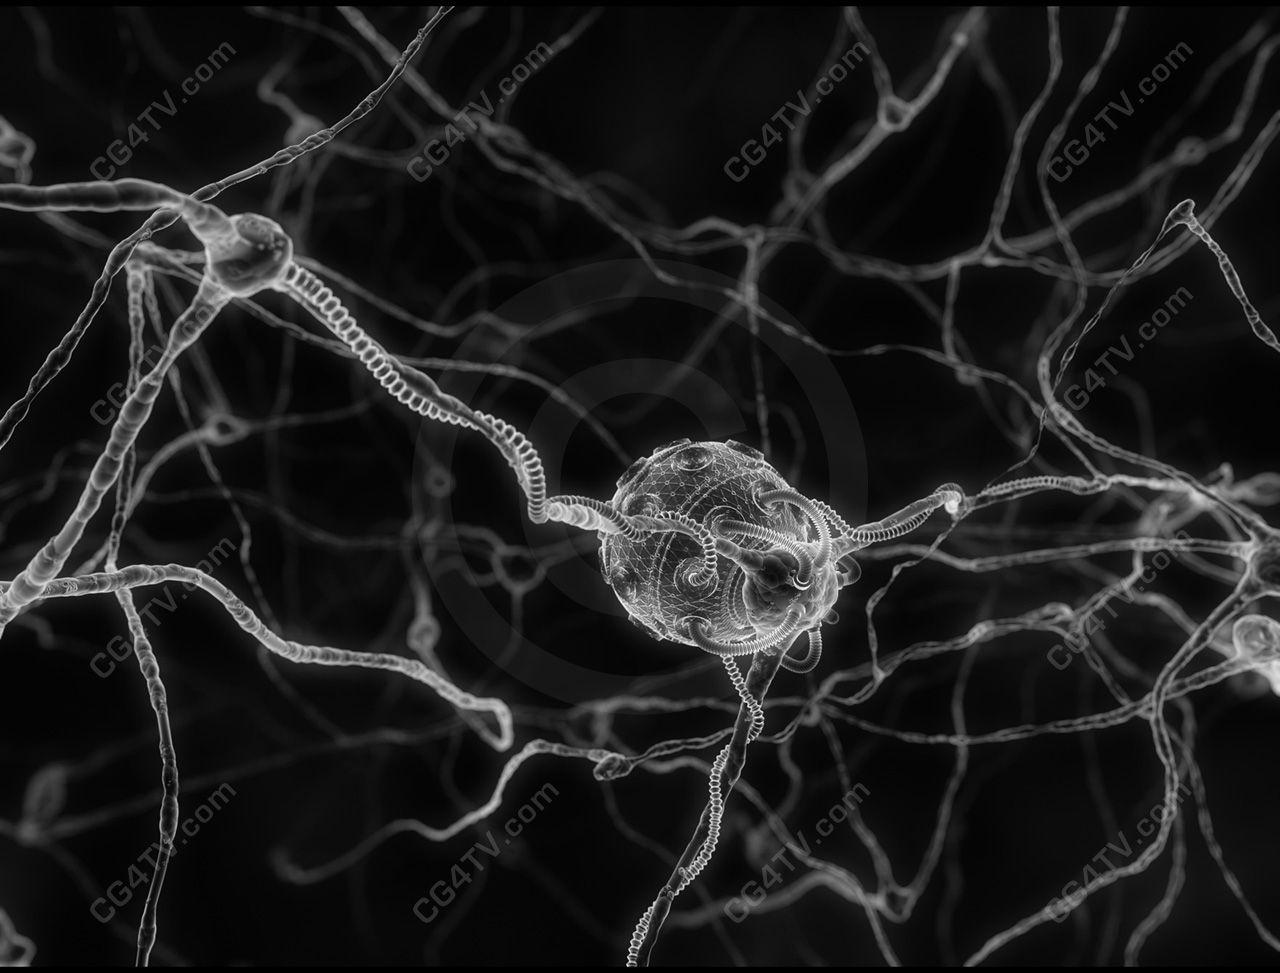 cells under microscope - Google Search | micro | Pinterest